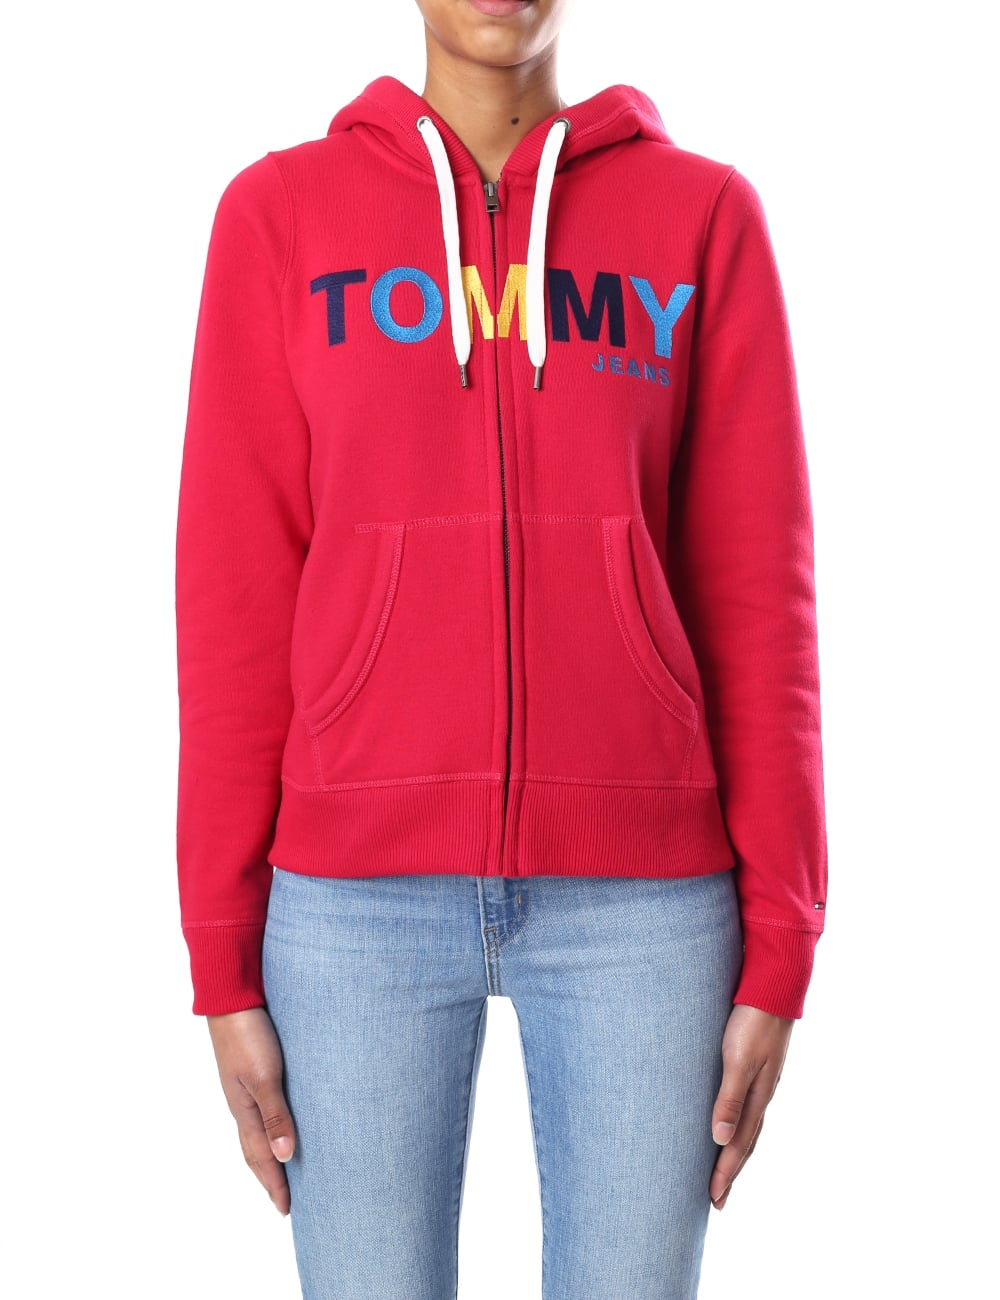 007b527afbb77 Tommy Hilfiger Womens Full Zip Hooded Logo Sweatshirt